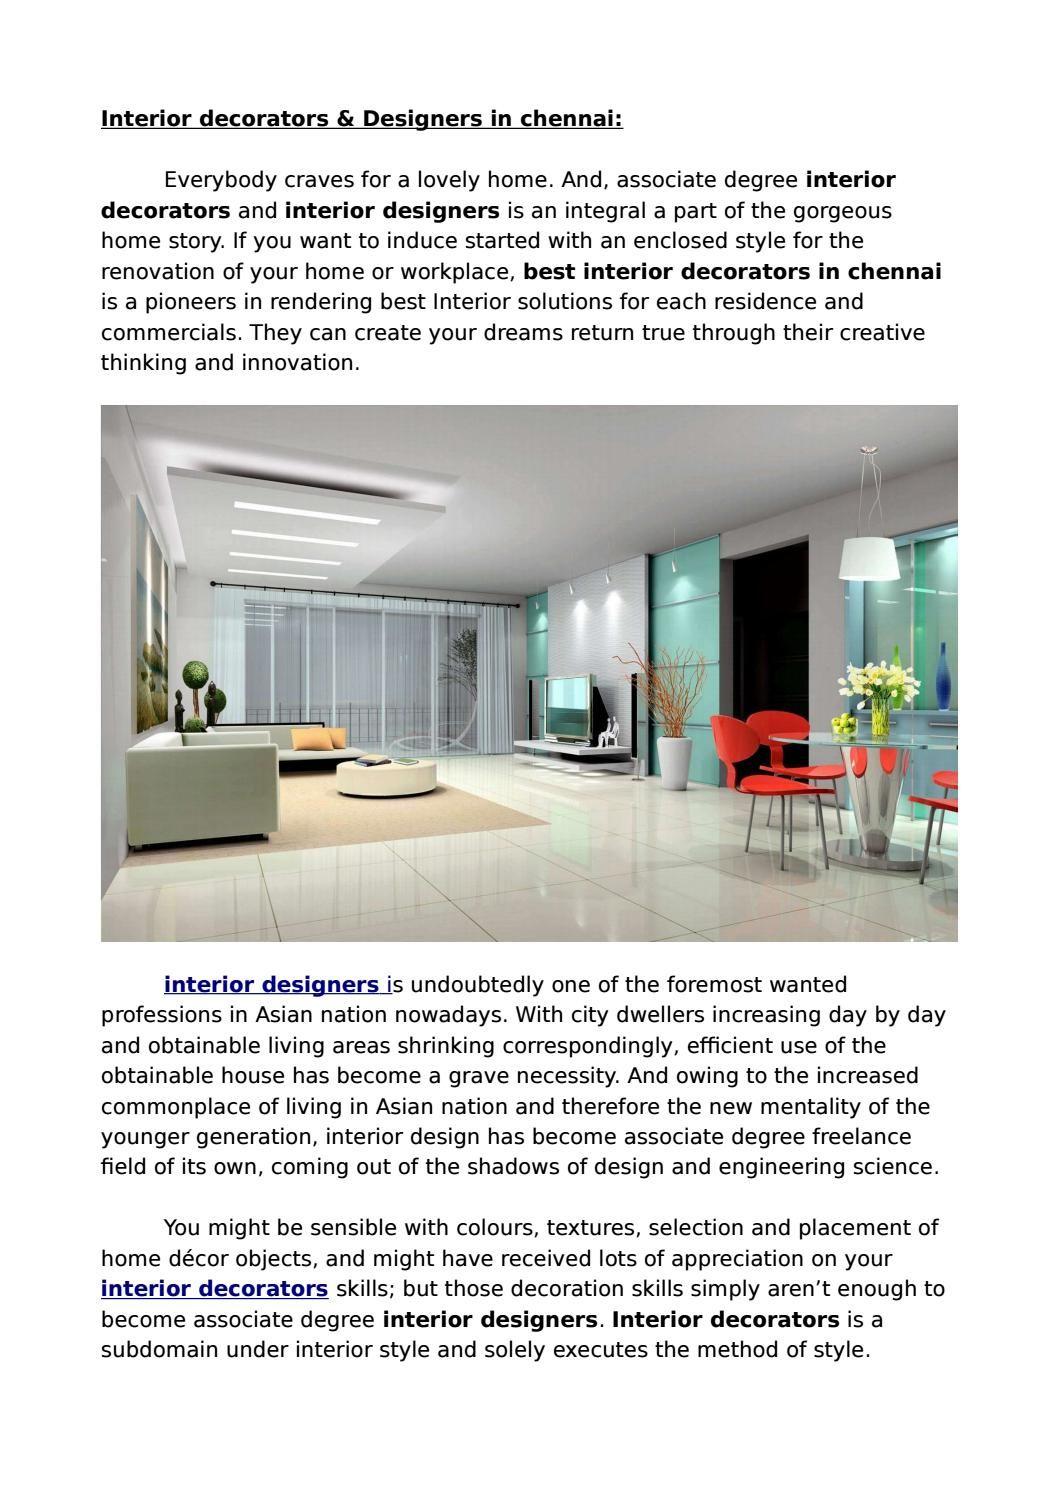 Best interior decorators  designers in chennai also justseemobileapp marketing on pinterest rh